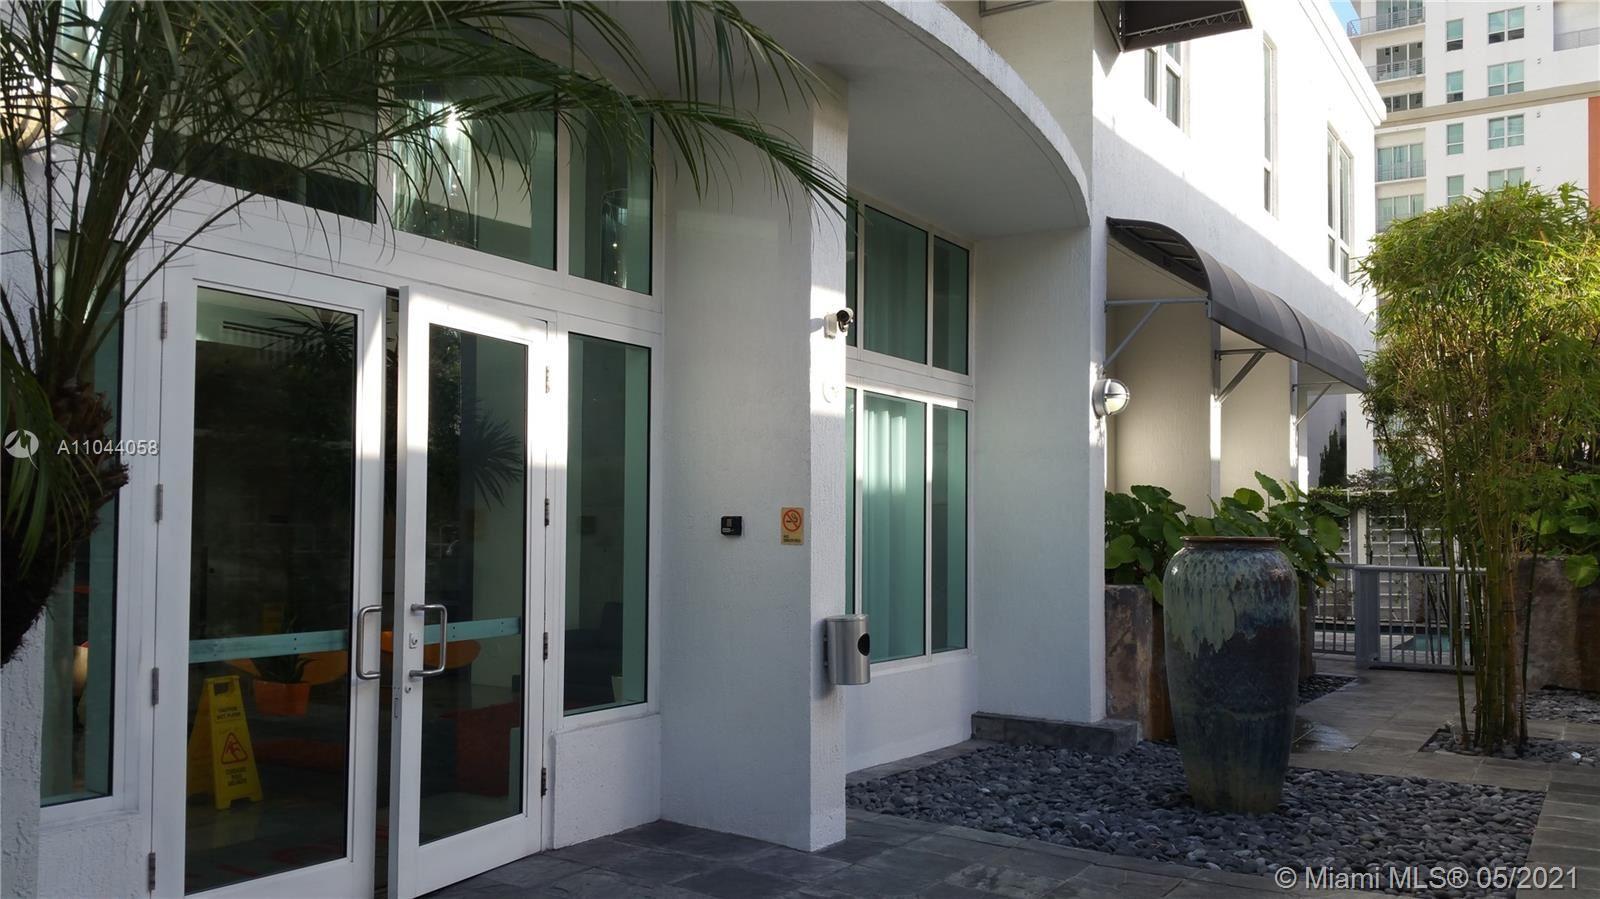 234 NE 3rd St #809, Miami, FL 33132 - #: A11044058